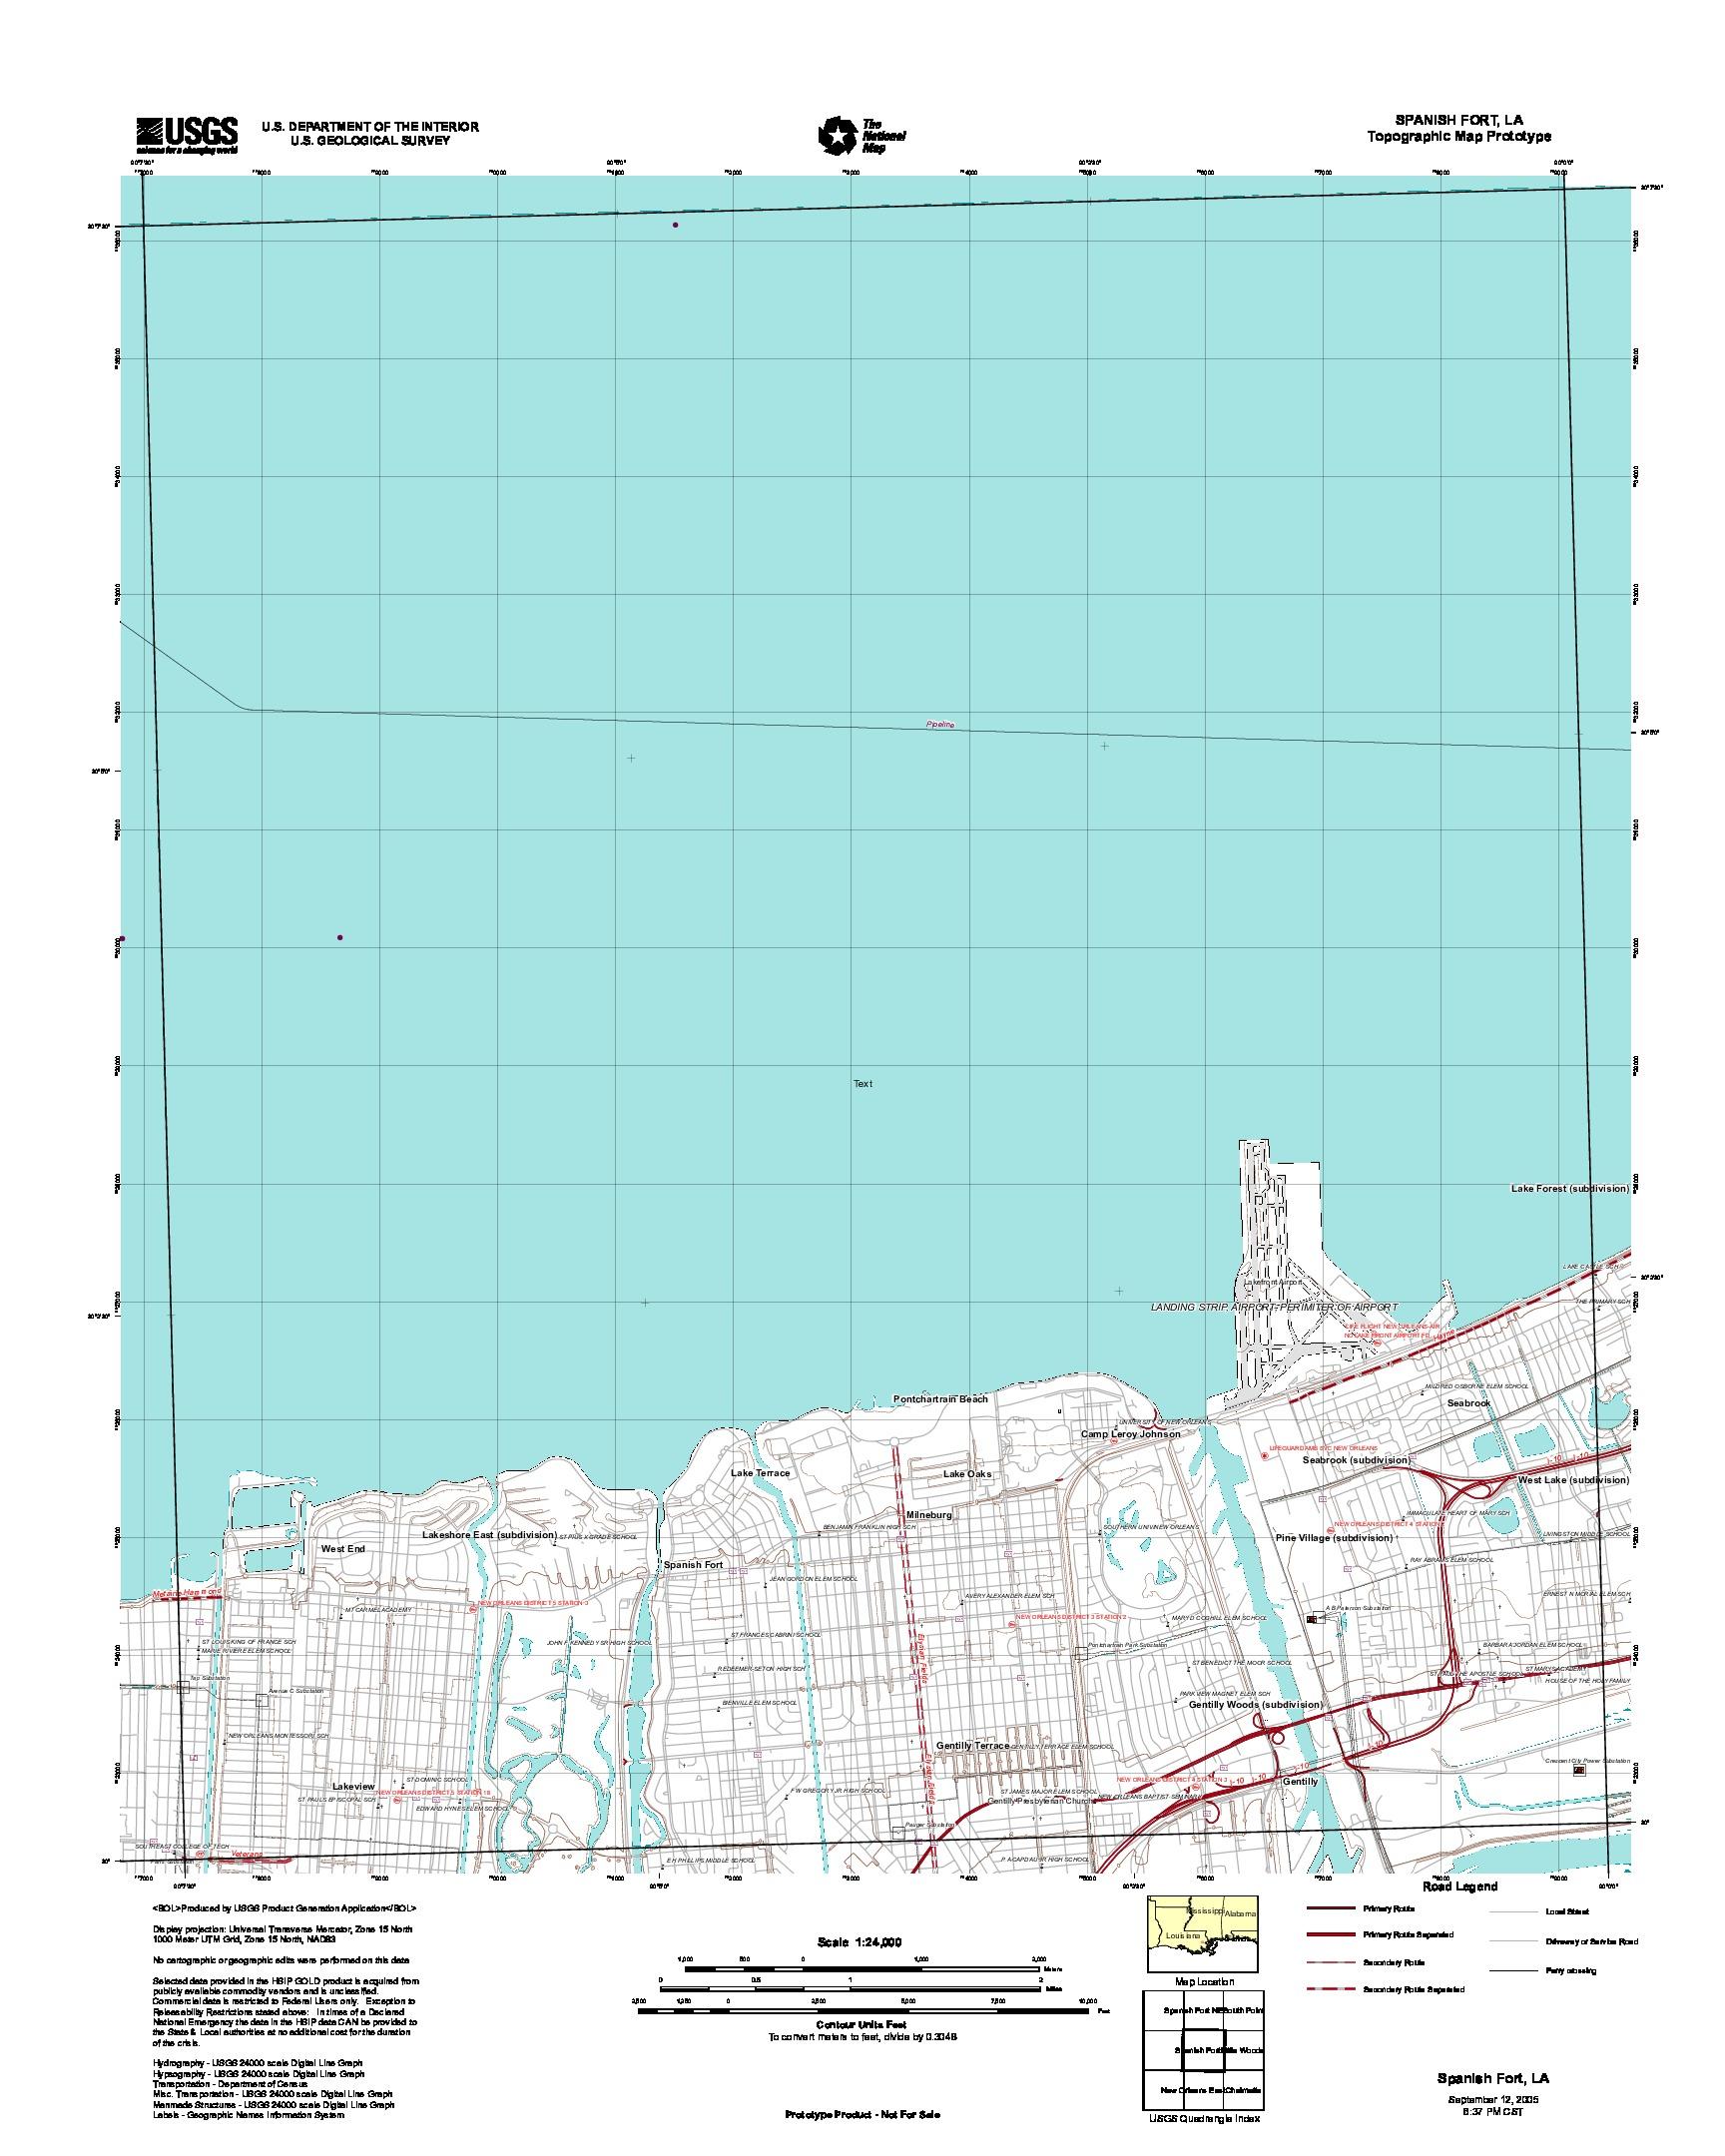 Spanish Fort, Topographic Map Prototype, Louisiana, United States, September 12, 2005